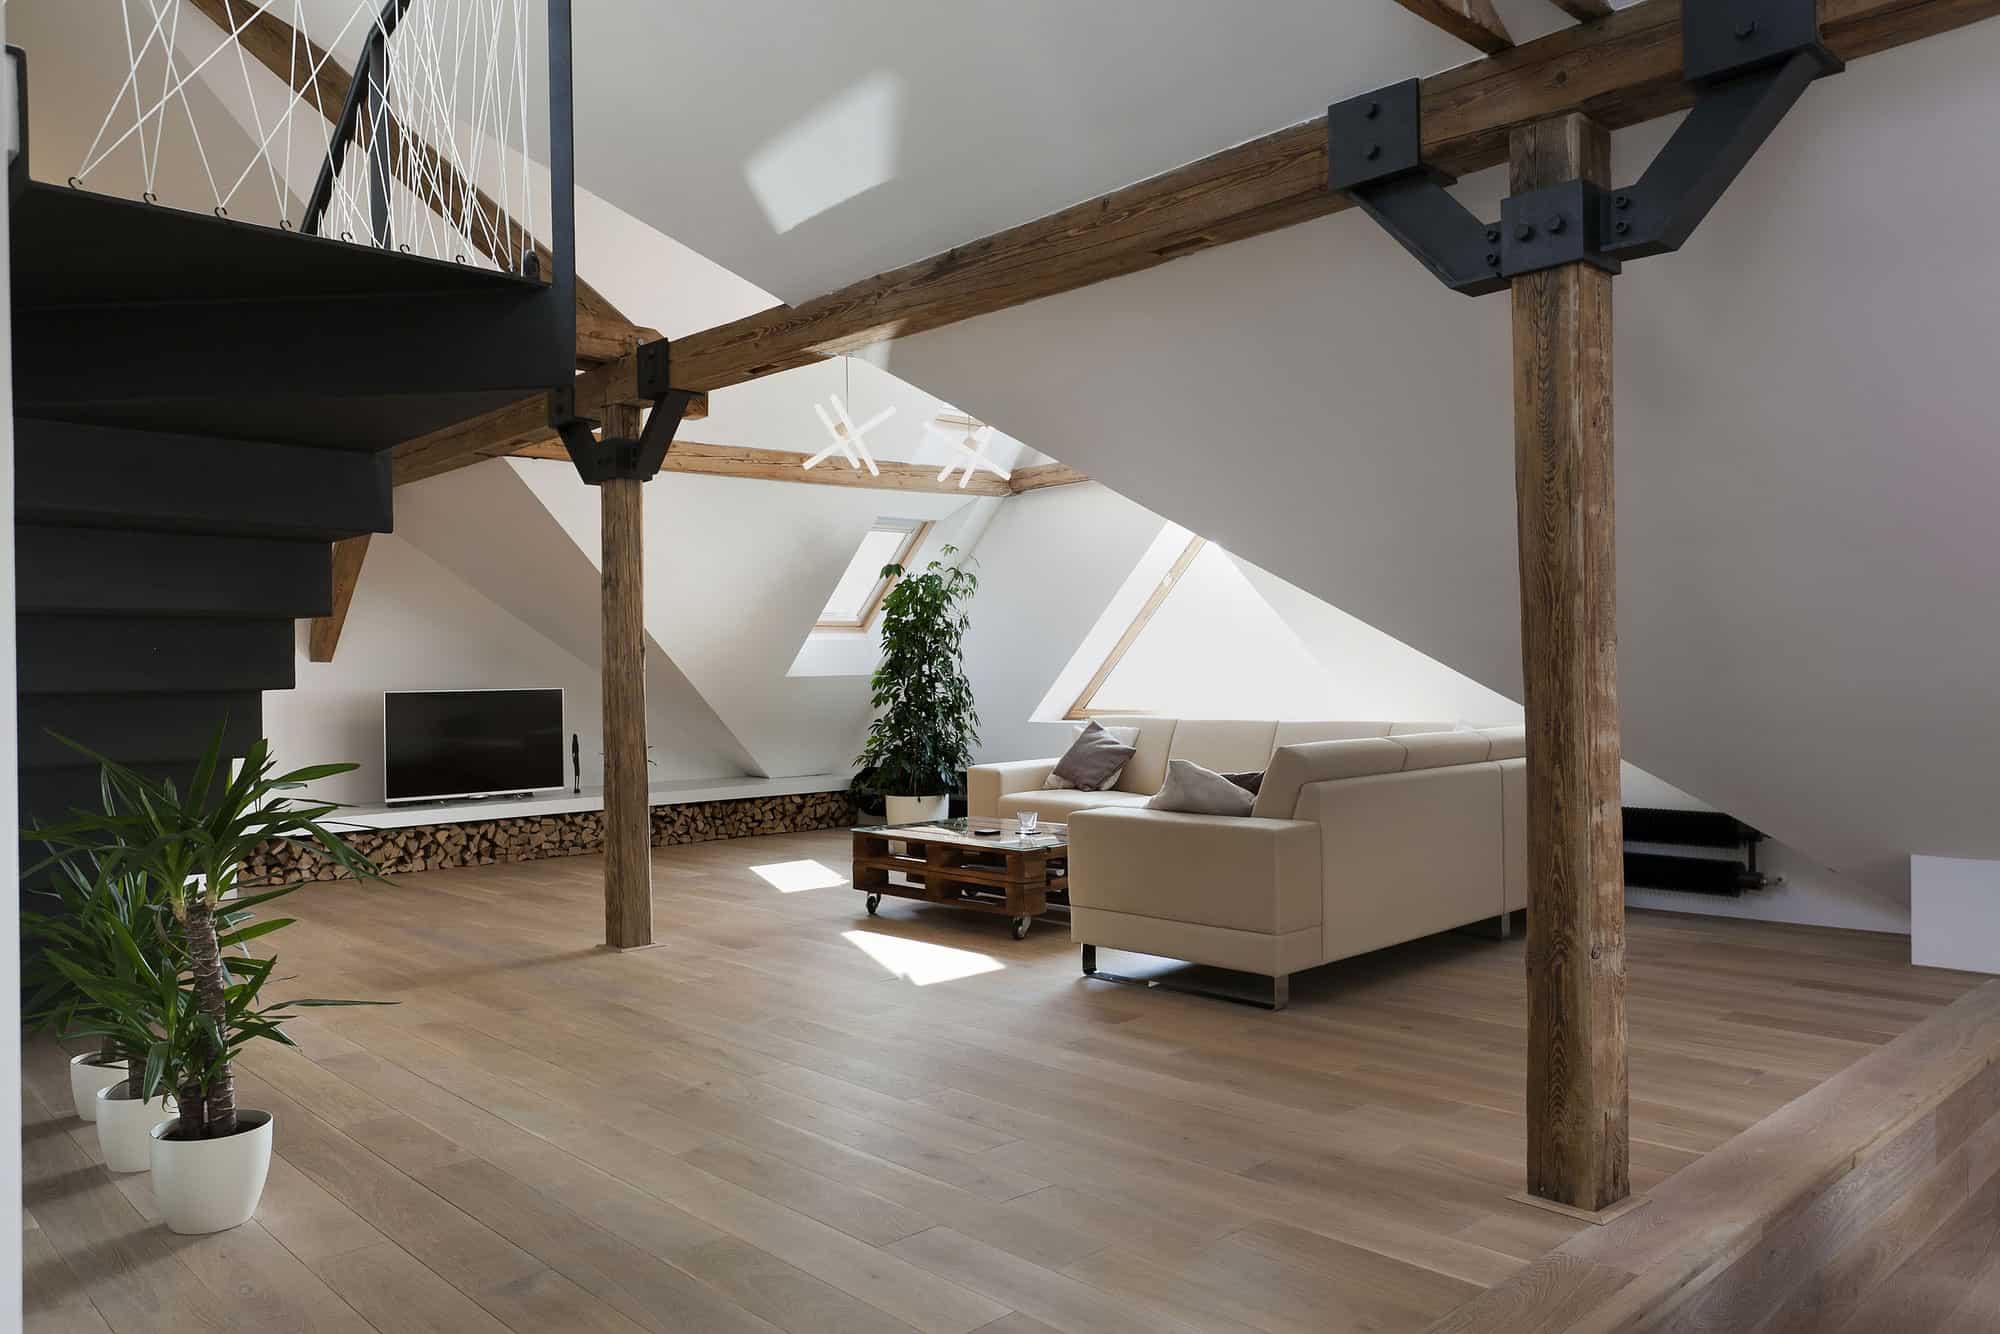 Attic Loft Reconstruction by B Architecture